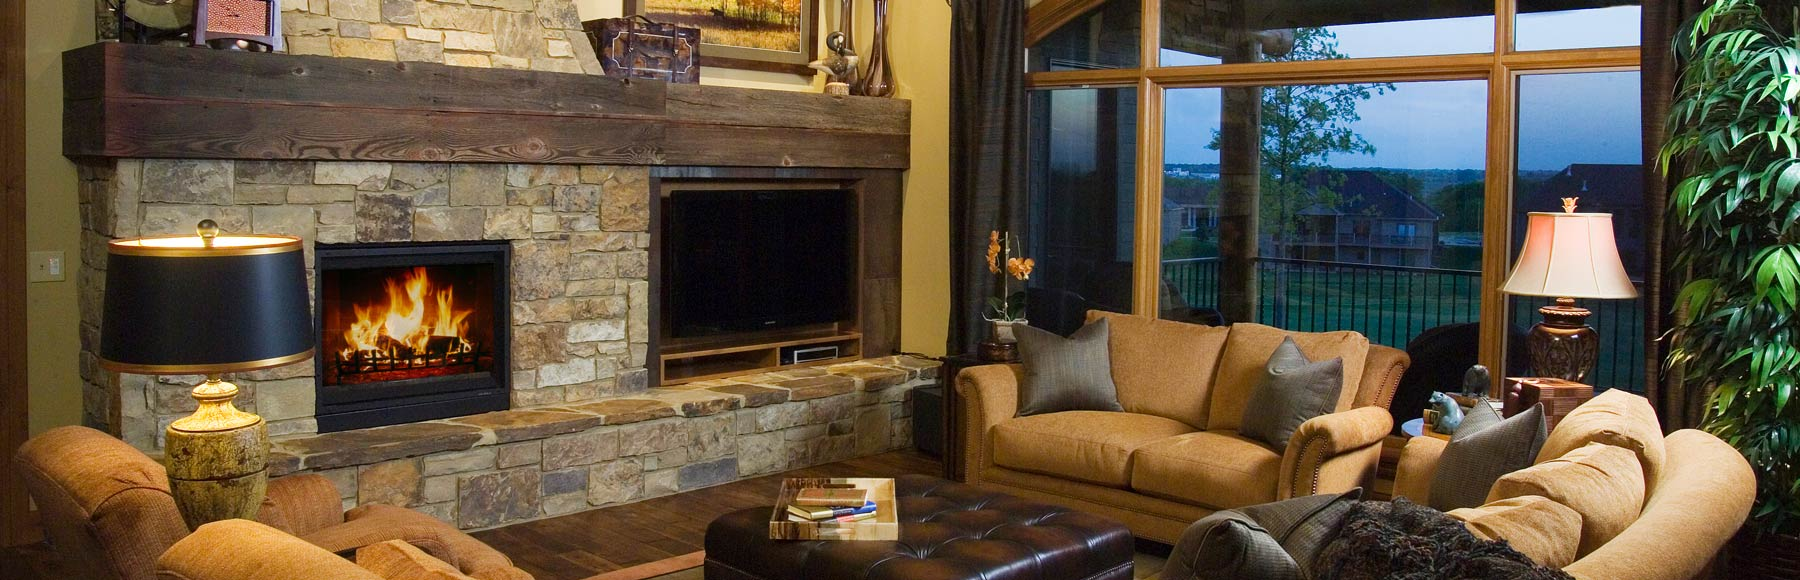 LA-Home-Builders-Lincoln-Nebraska-Beautiful-Living-Room-With-Fireplace-1800x580.jpg